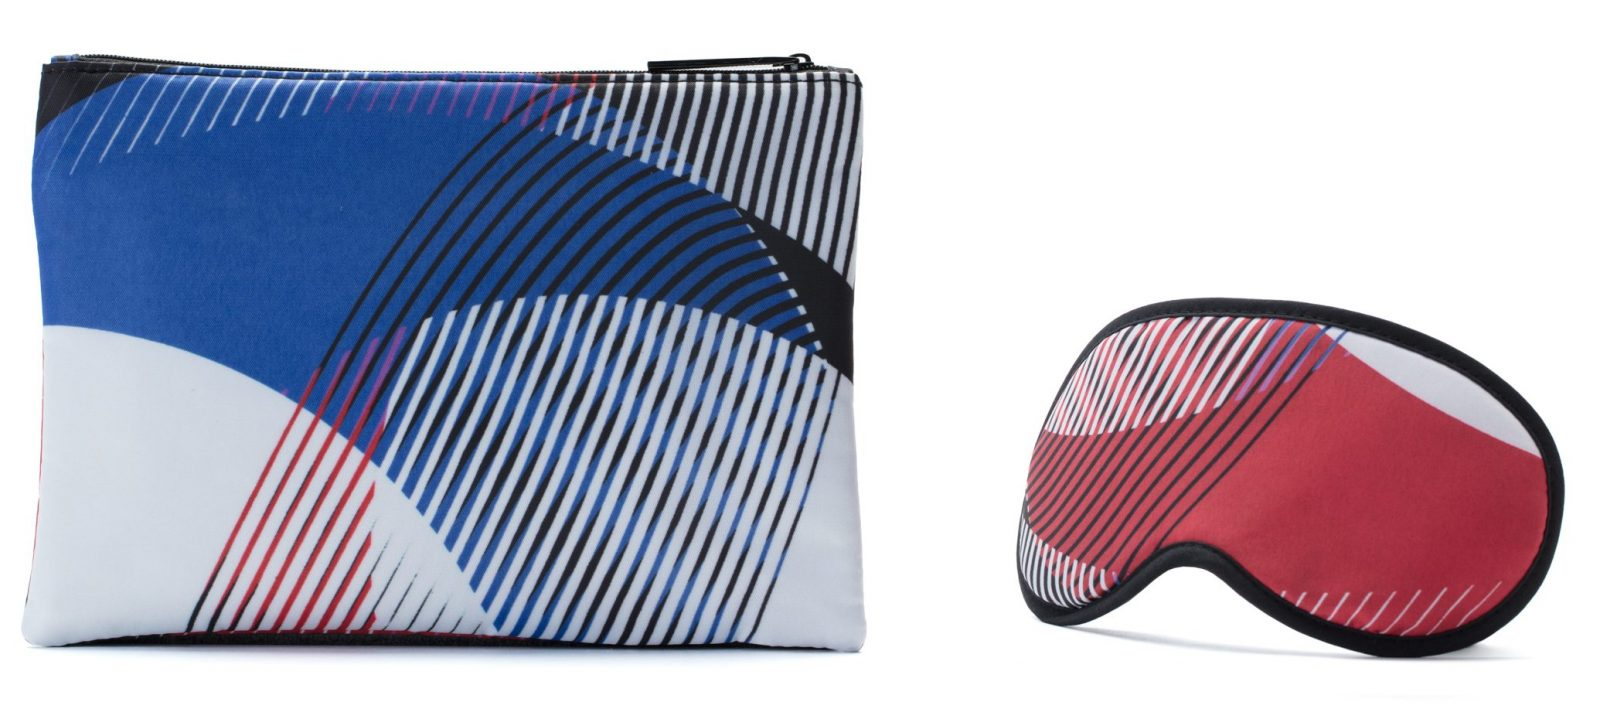 Qantas art Kate Banazi - Adas' Algorithm